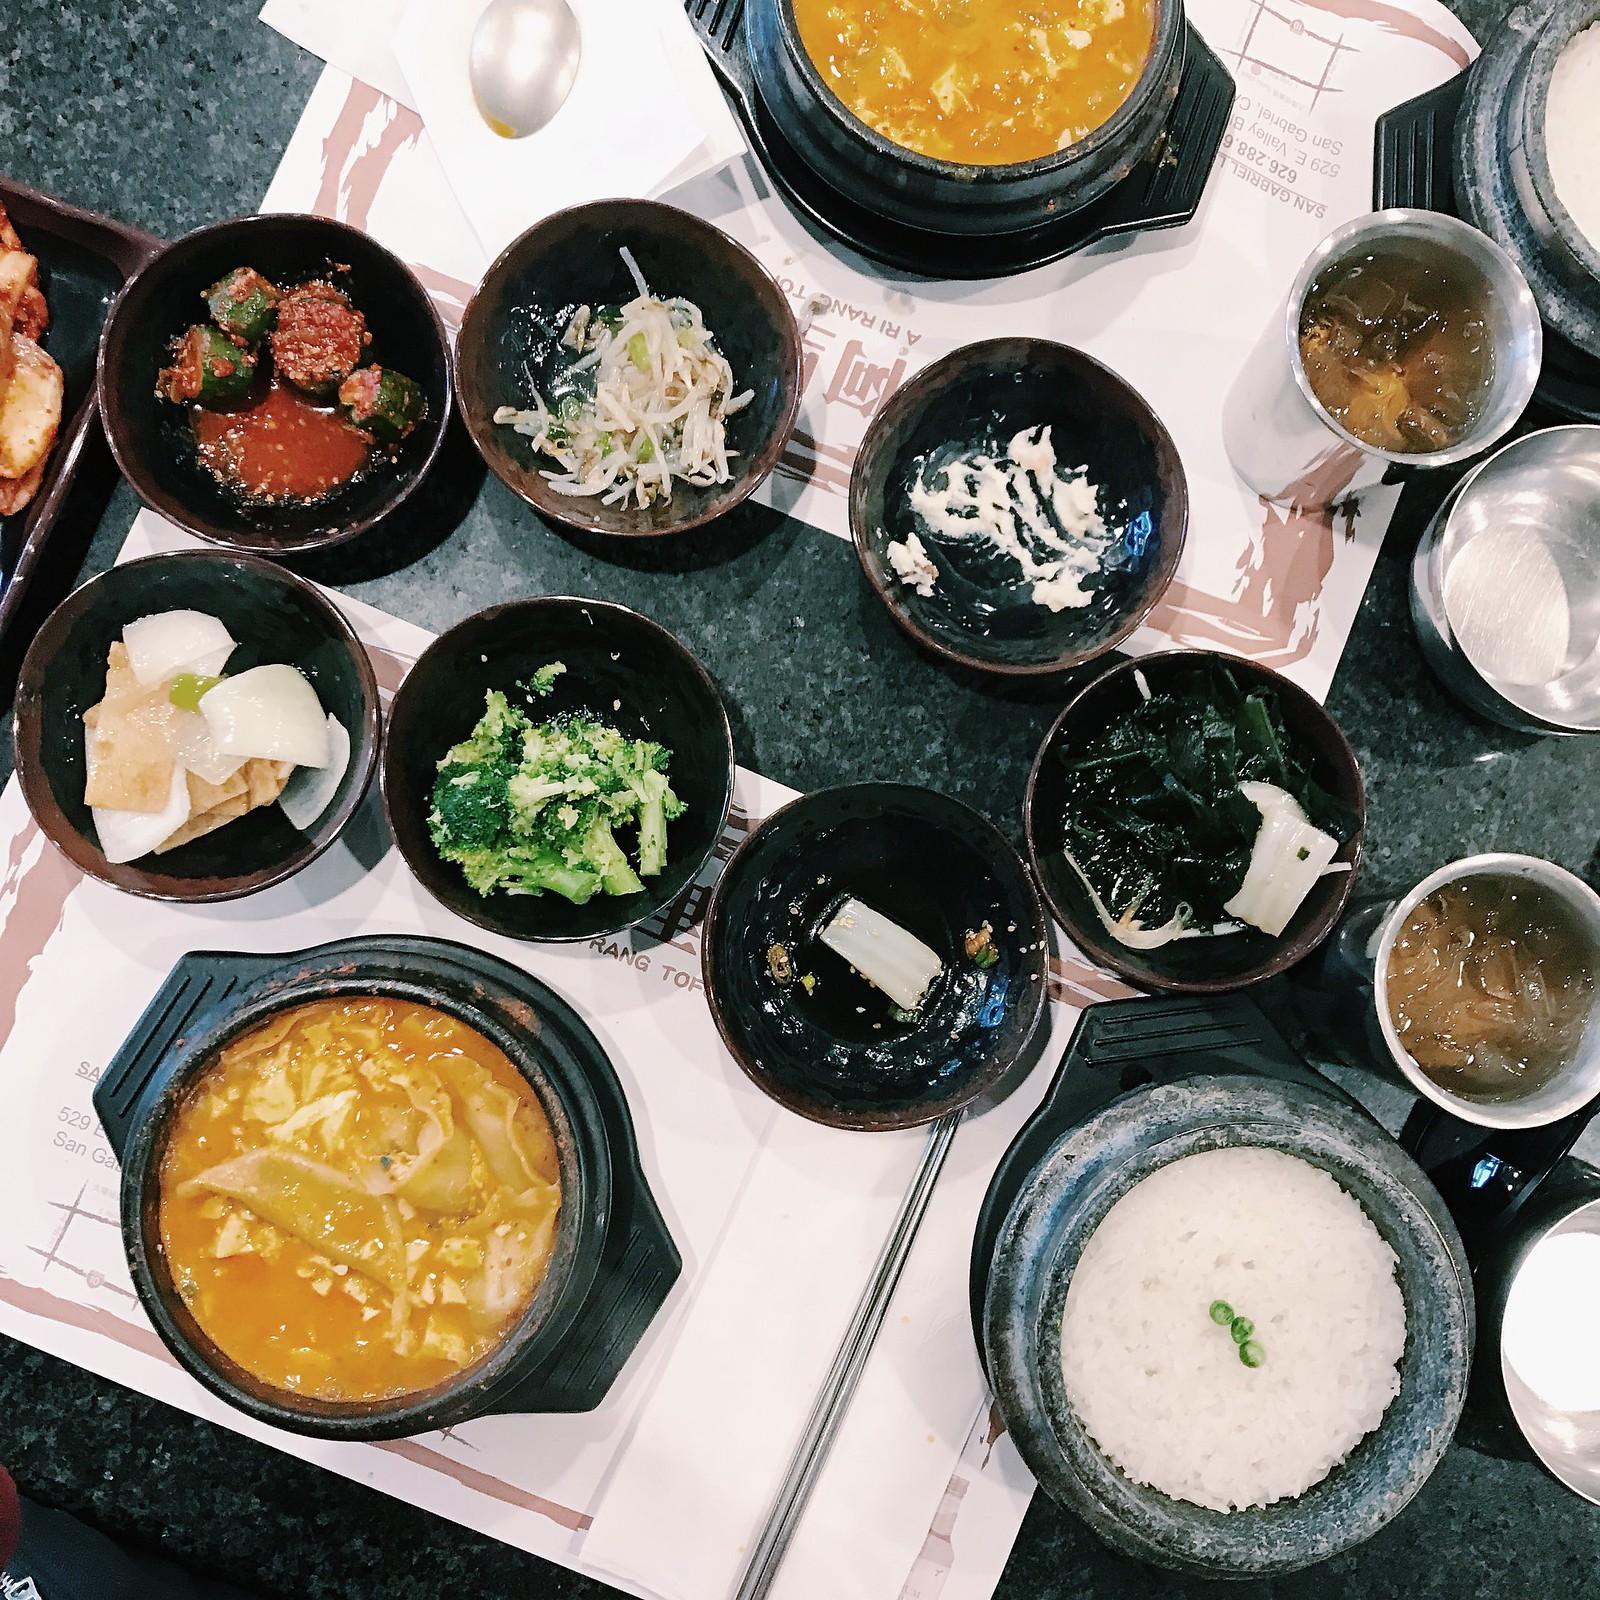 0246-tofusou-tofuhouse-korean-koreanfood-foodie-lifestyle-elizabeeetht-flatlay-lifestyle